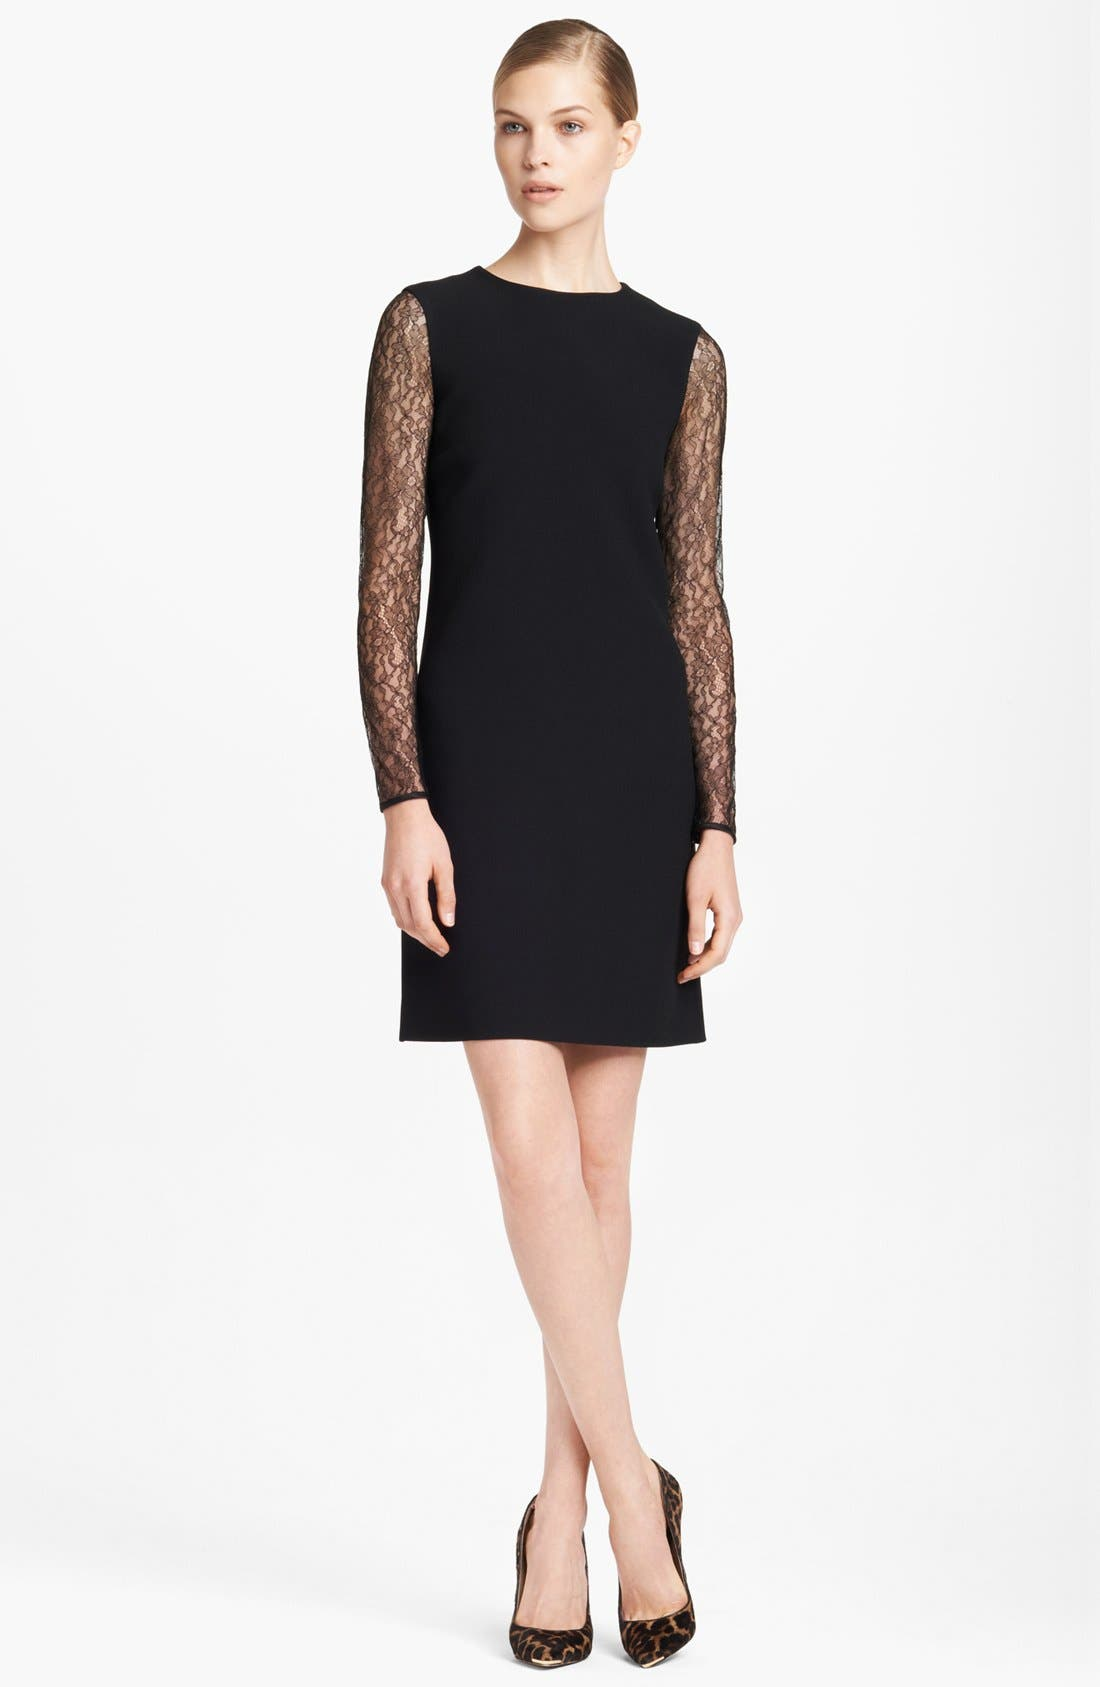 Main Image - Michael Kors Lace Sleeve Dress